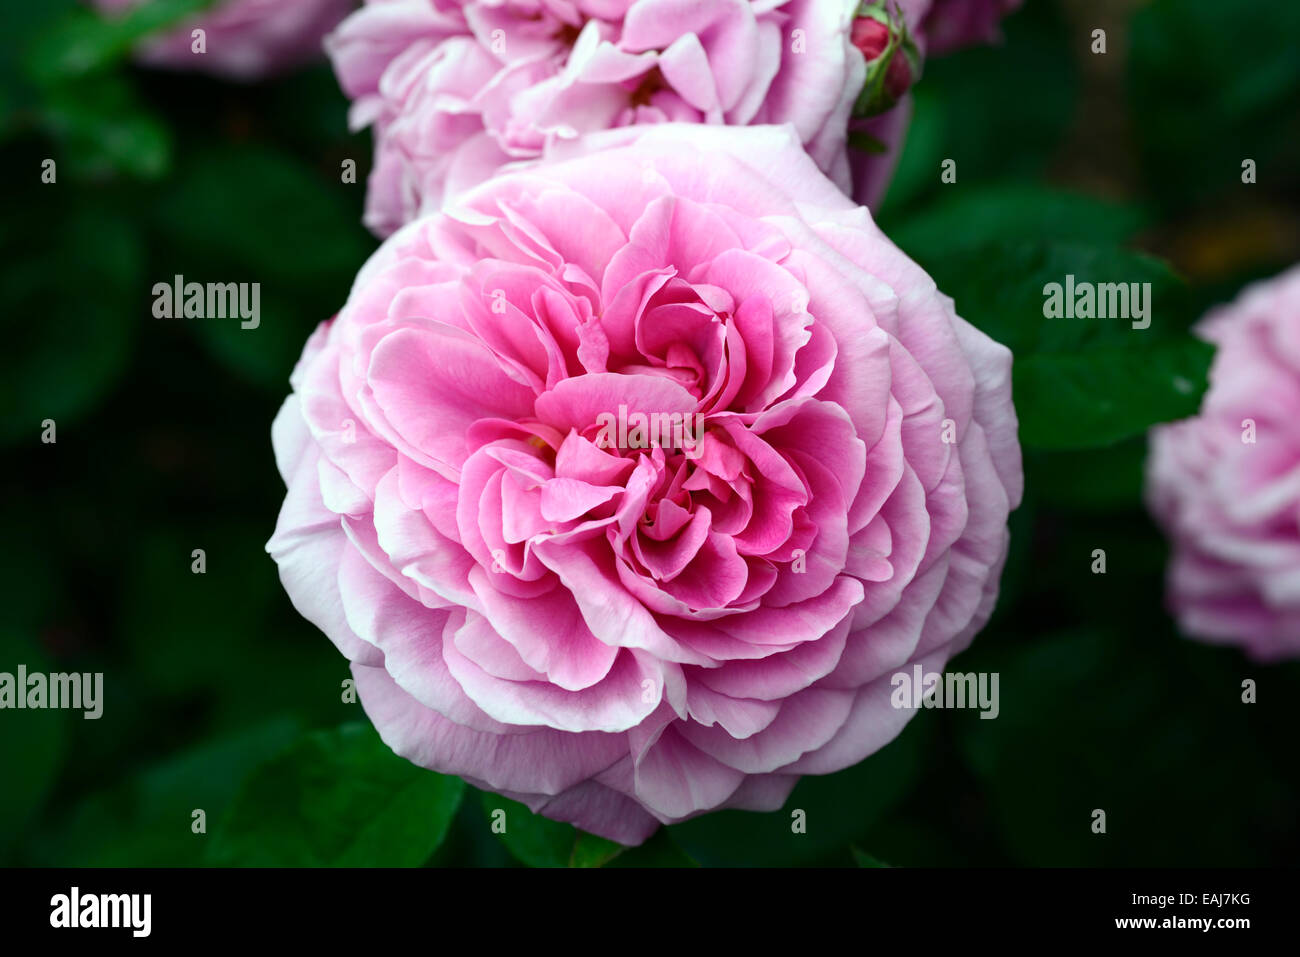 Rosa gertrude jekyll ausbord rose flower pink flowering flowers rosa gertrude jekyll ausbord rose flower pink flowering flowers fragrant scented climbing climber shrub shrubs rm floral mightylinksfo